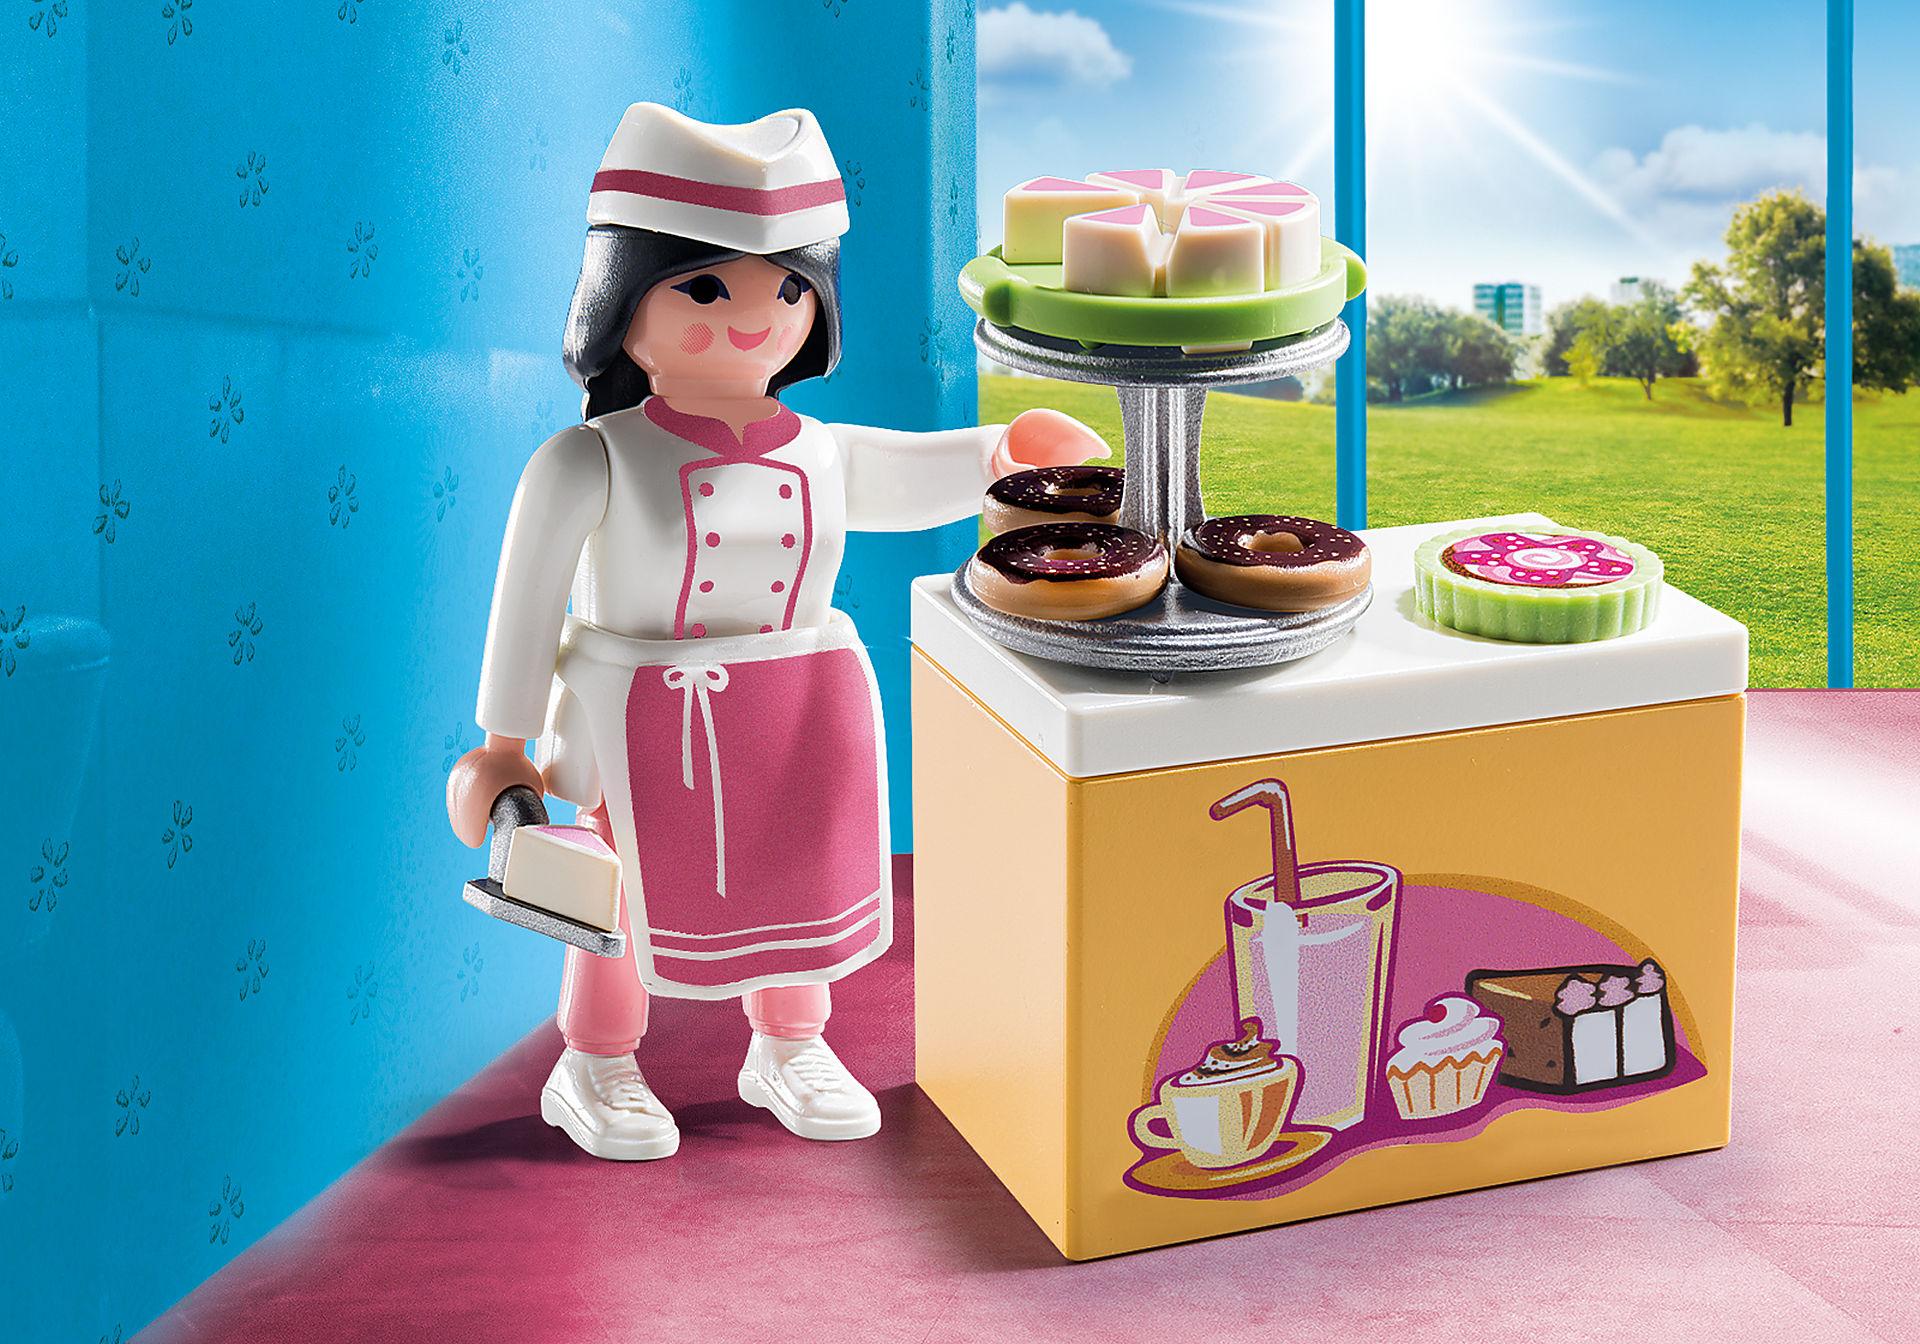 http://media.playmobil.com/i/playmobil/9097_product_detail/Konditorin mit Kuchentheke